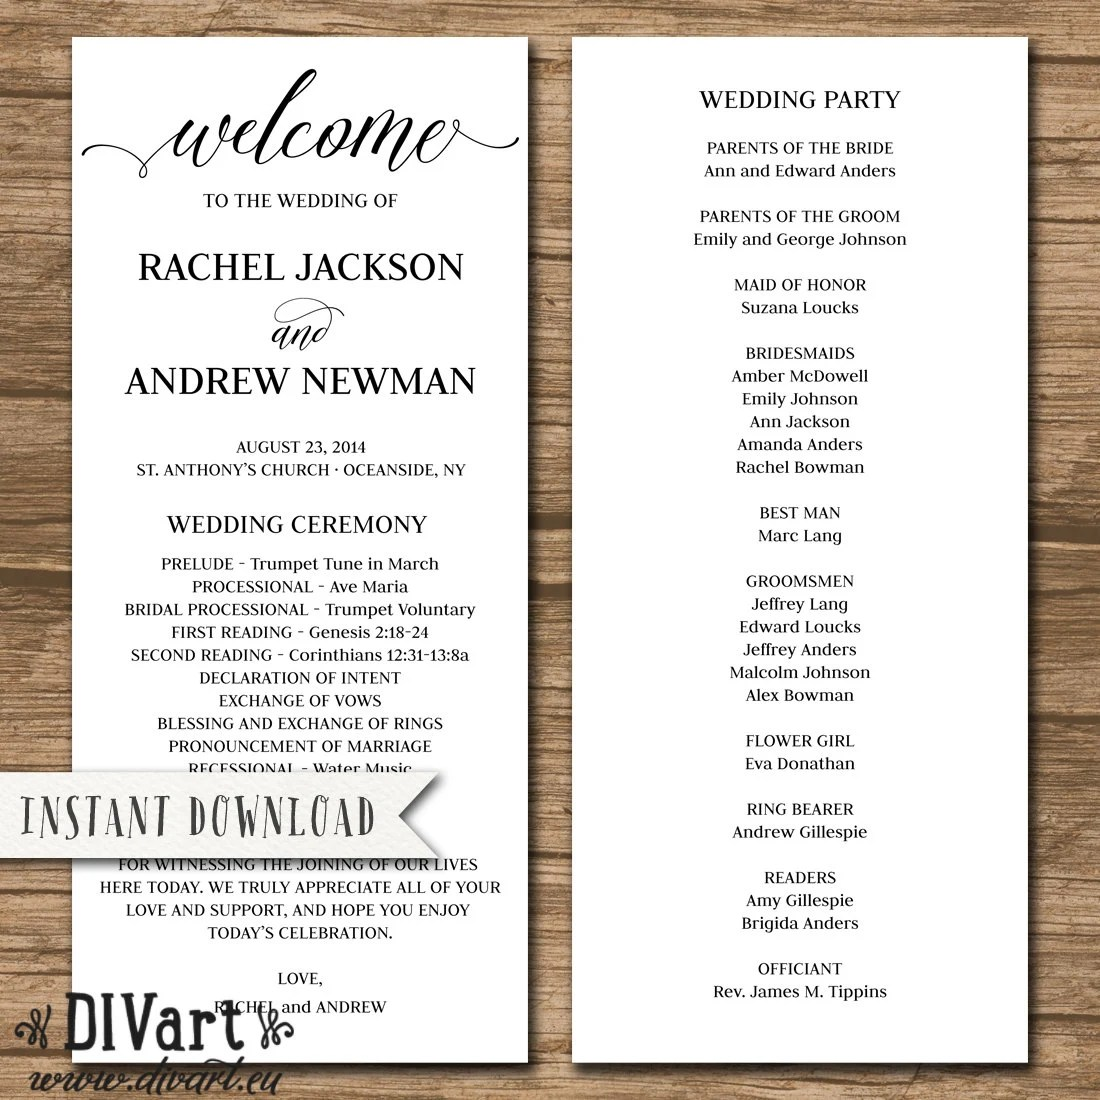 Rustic Wedding Program Wedding Ceremony Order of Events Etsy